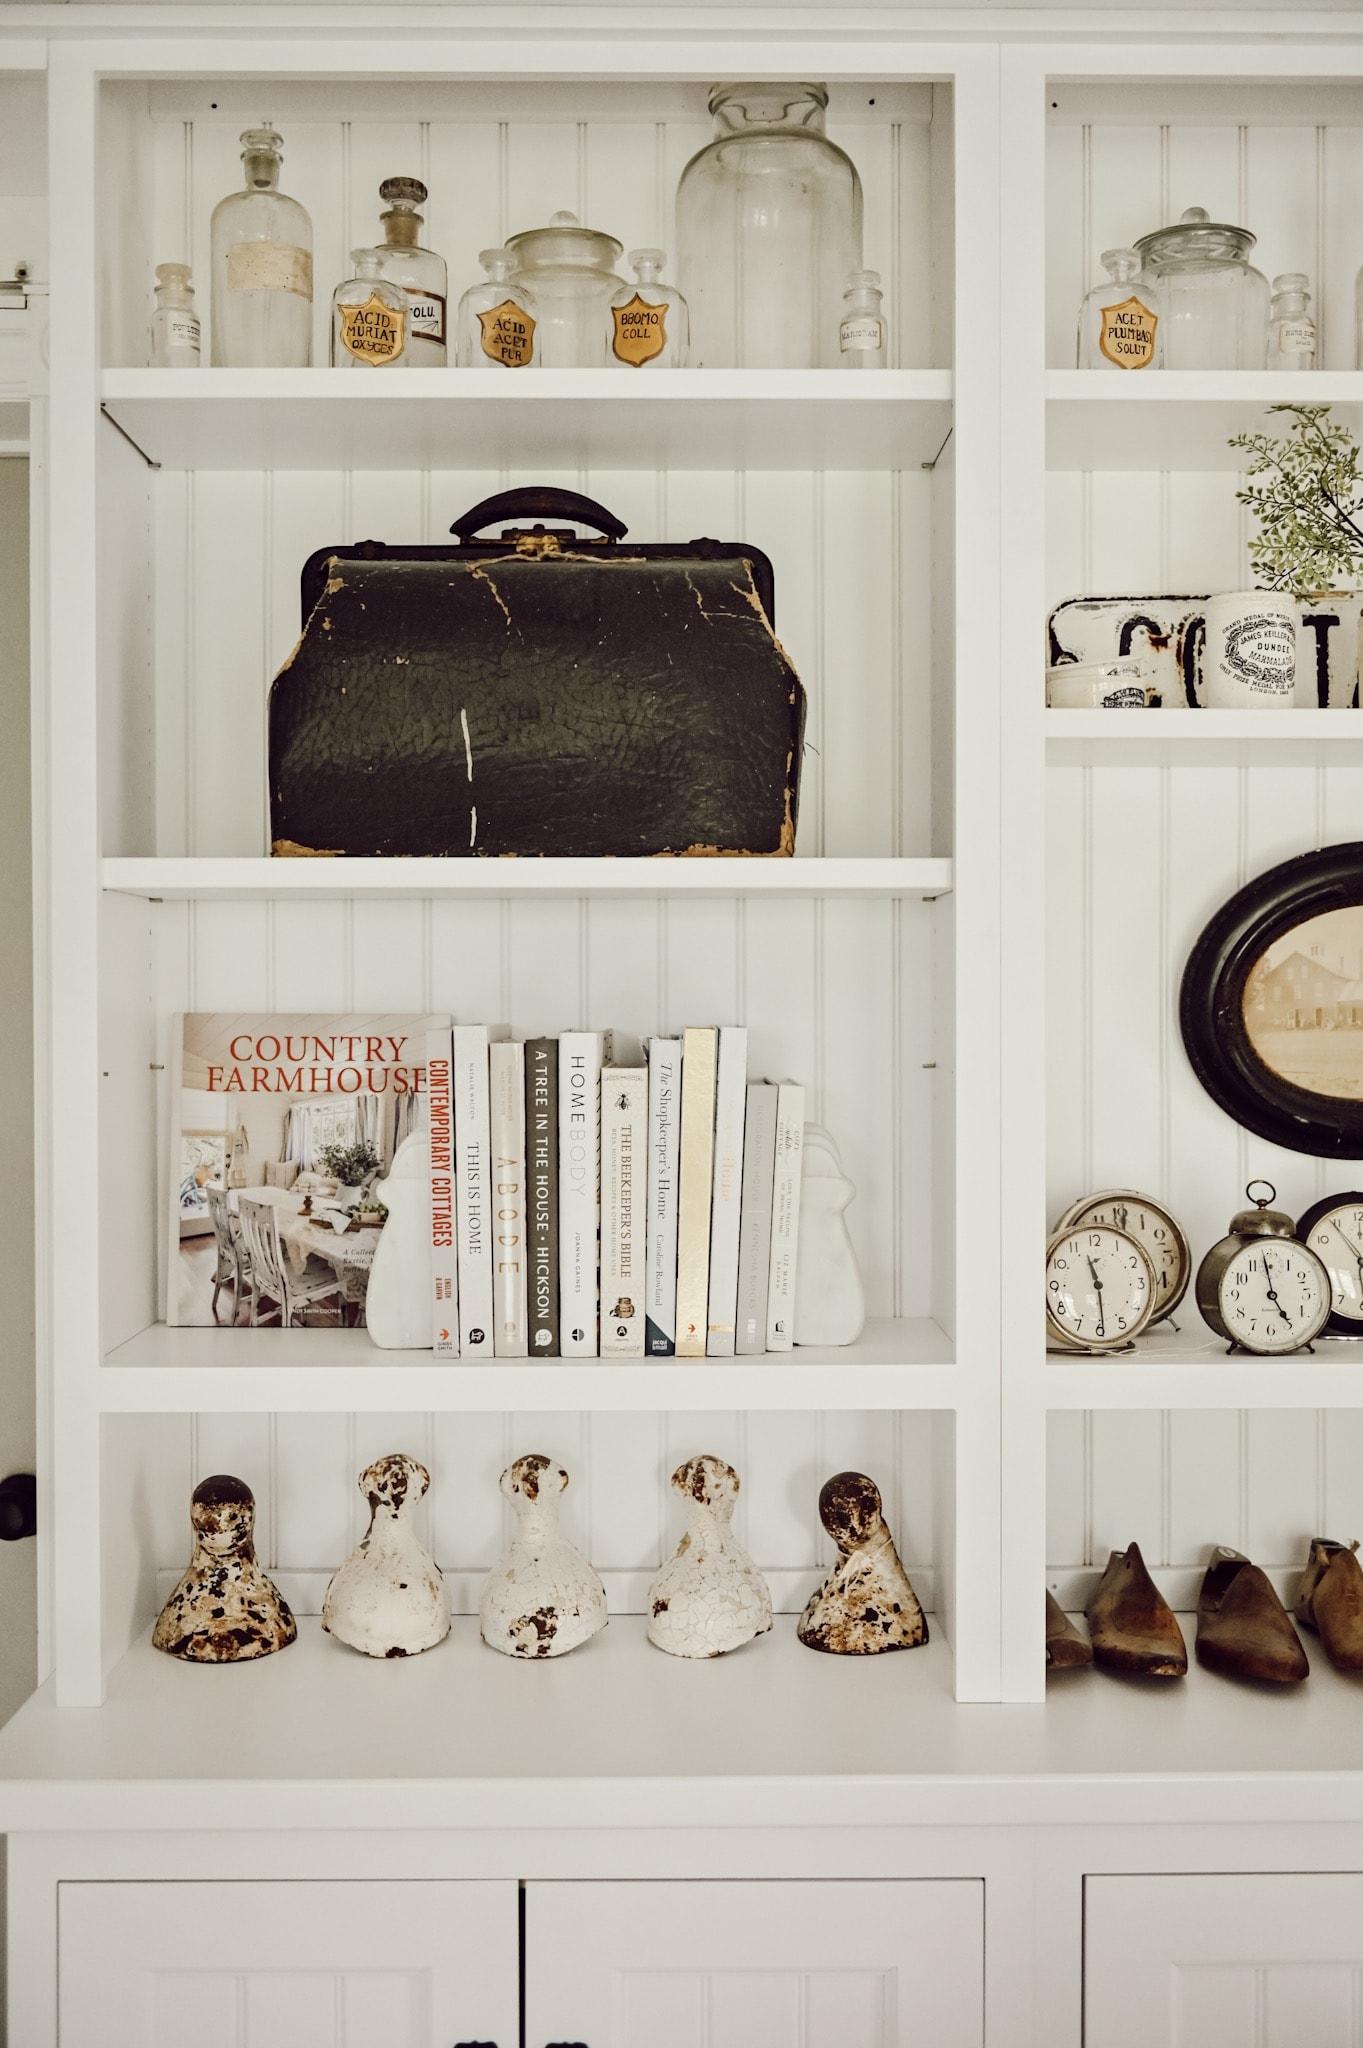 Decor shelf with favorite design books